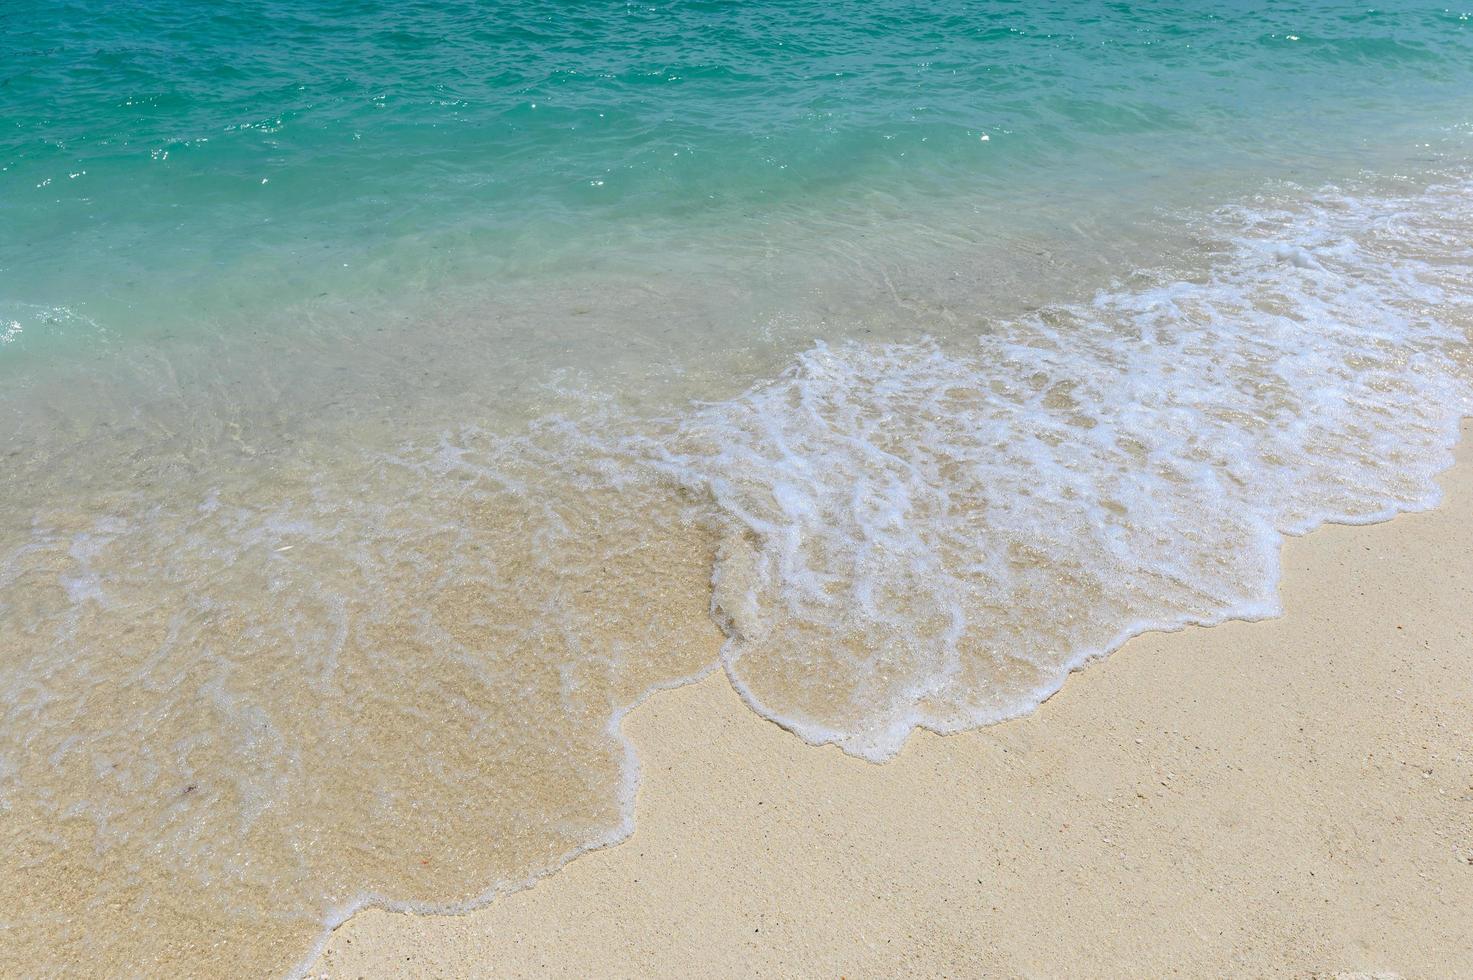 spruzzata di onde blu sulla spiaggia bianca foto